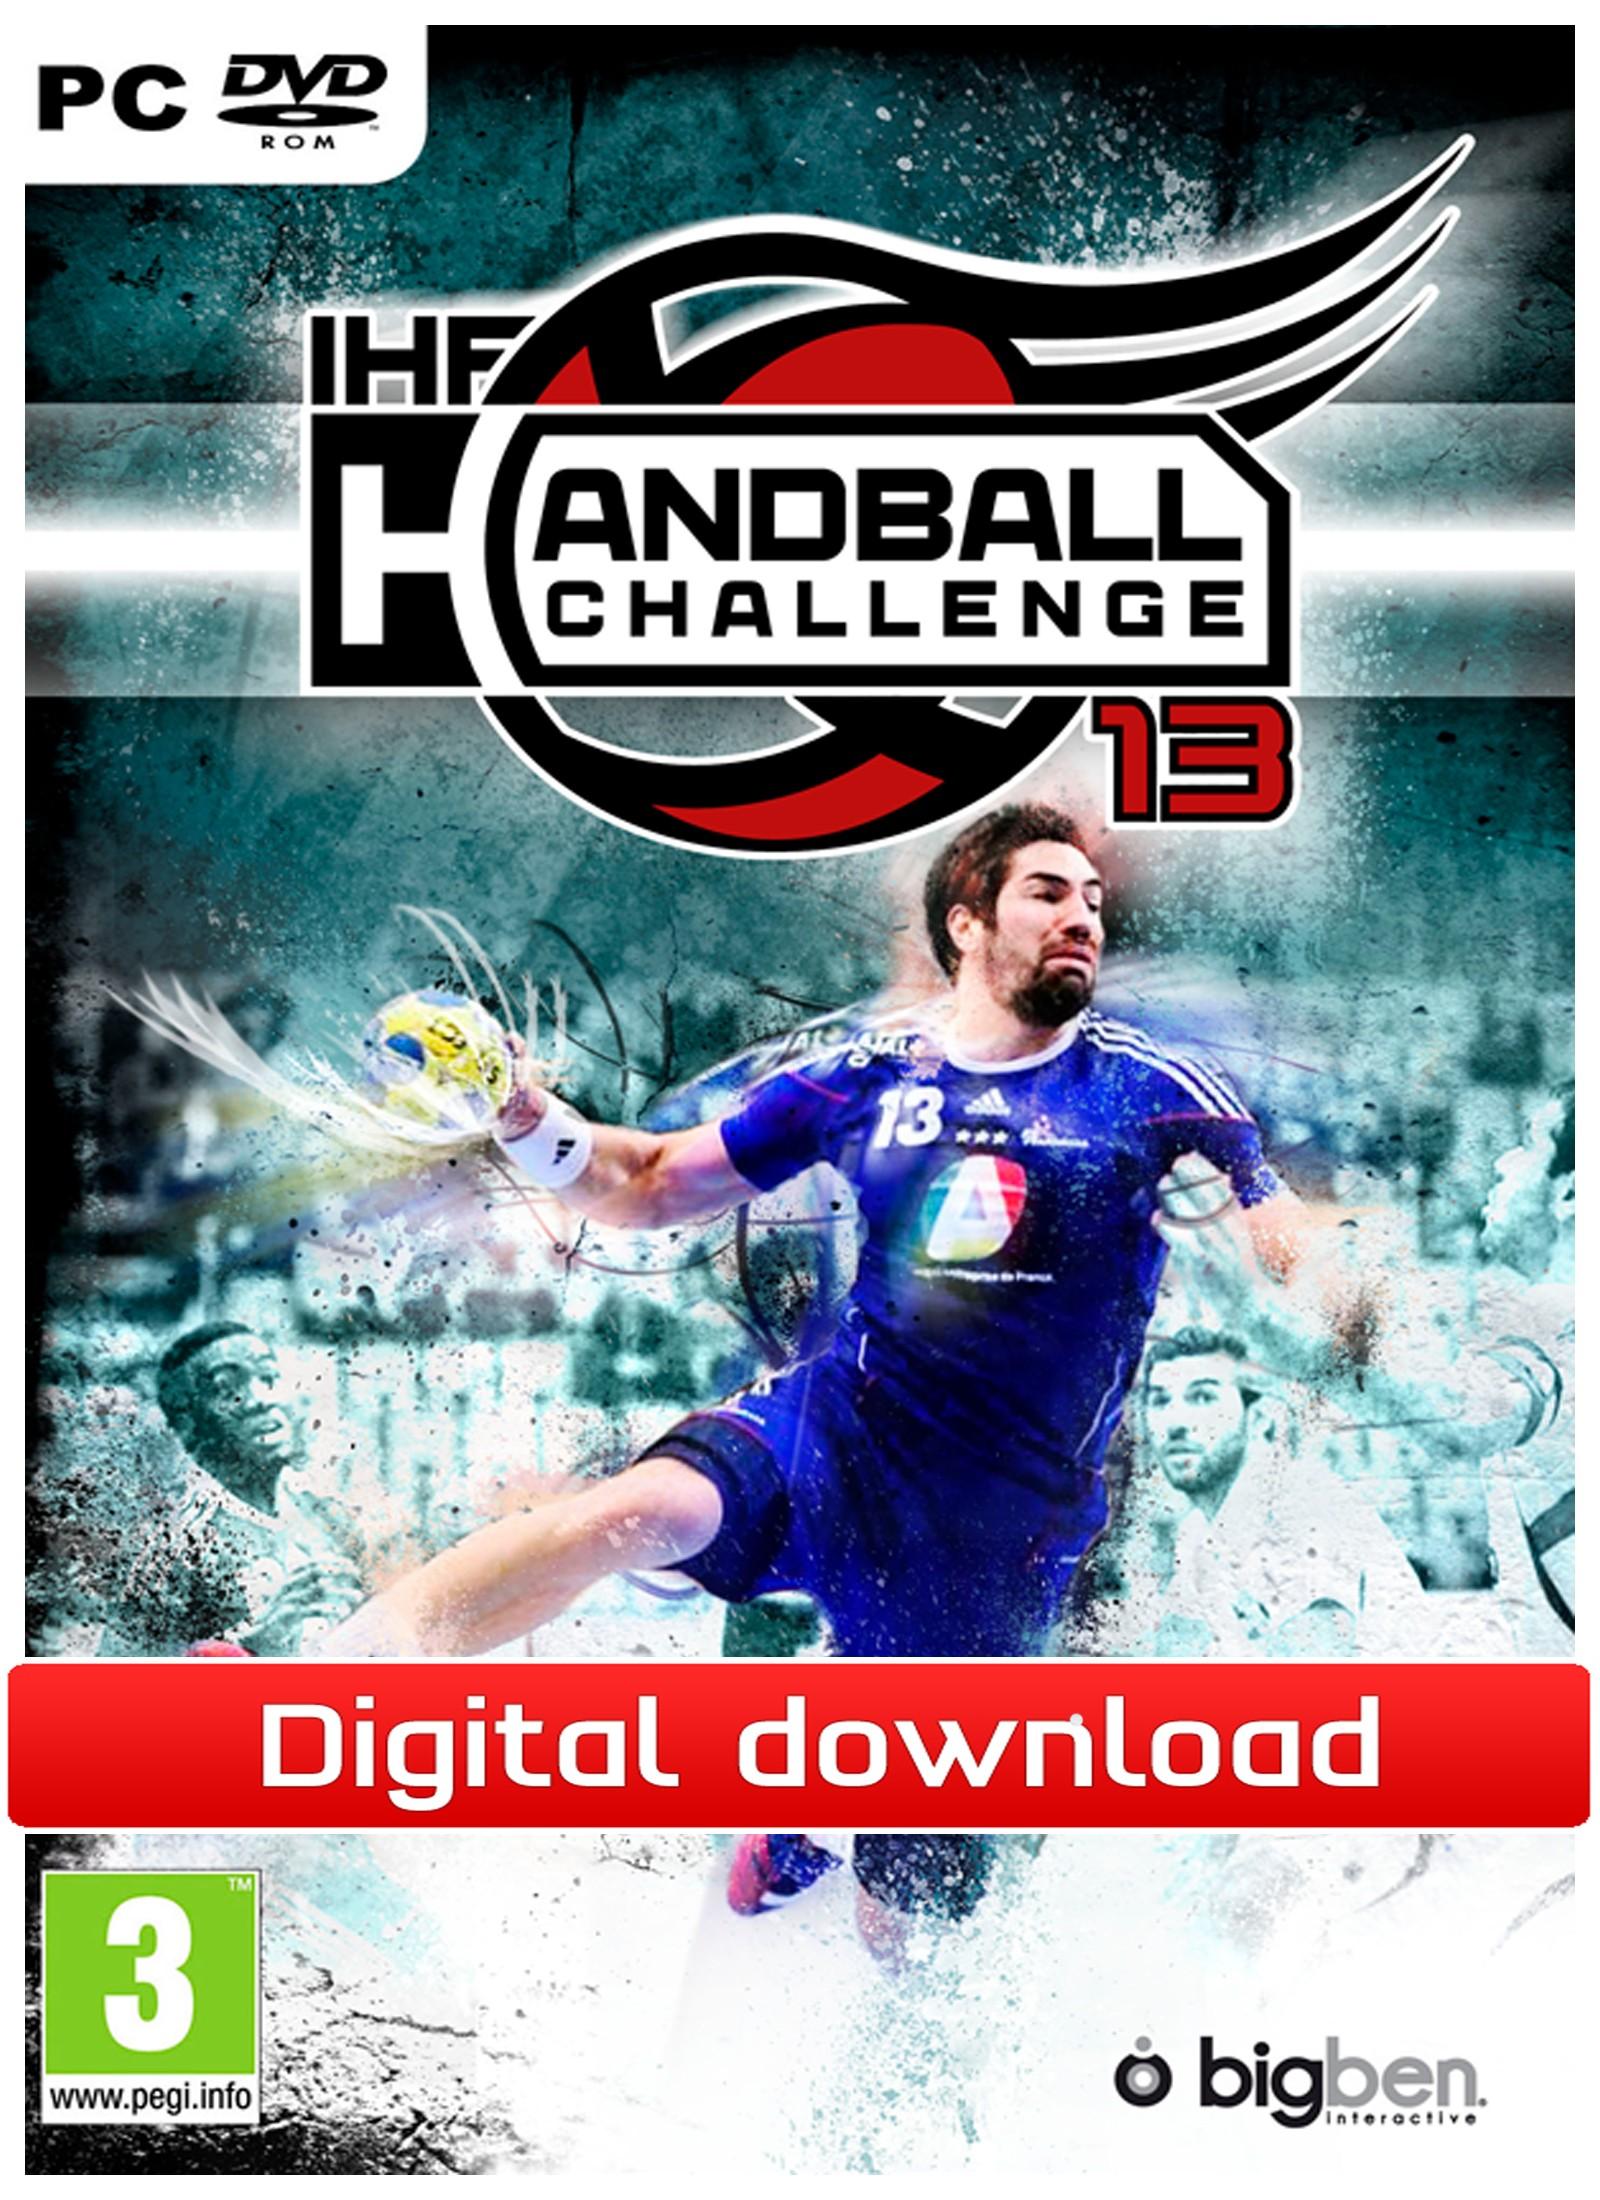 30737 : Handball Challenge 2013 (PC nedlastning)